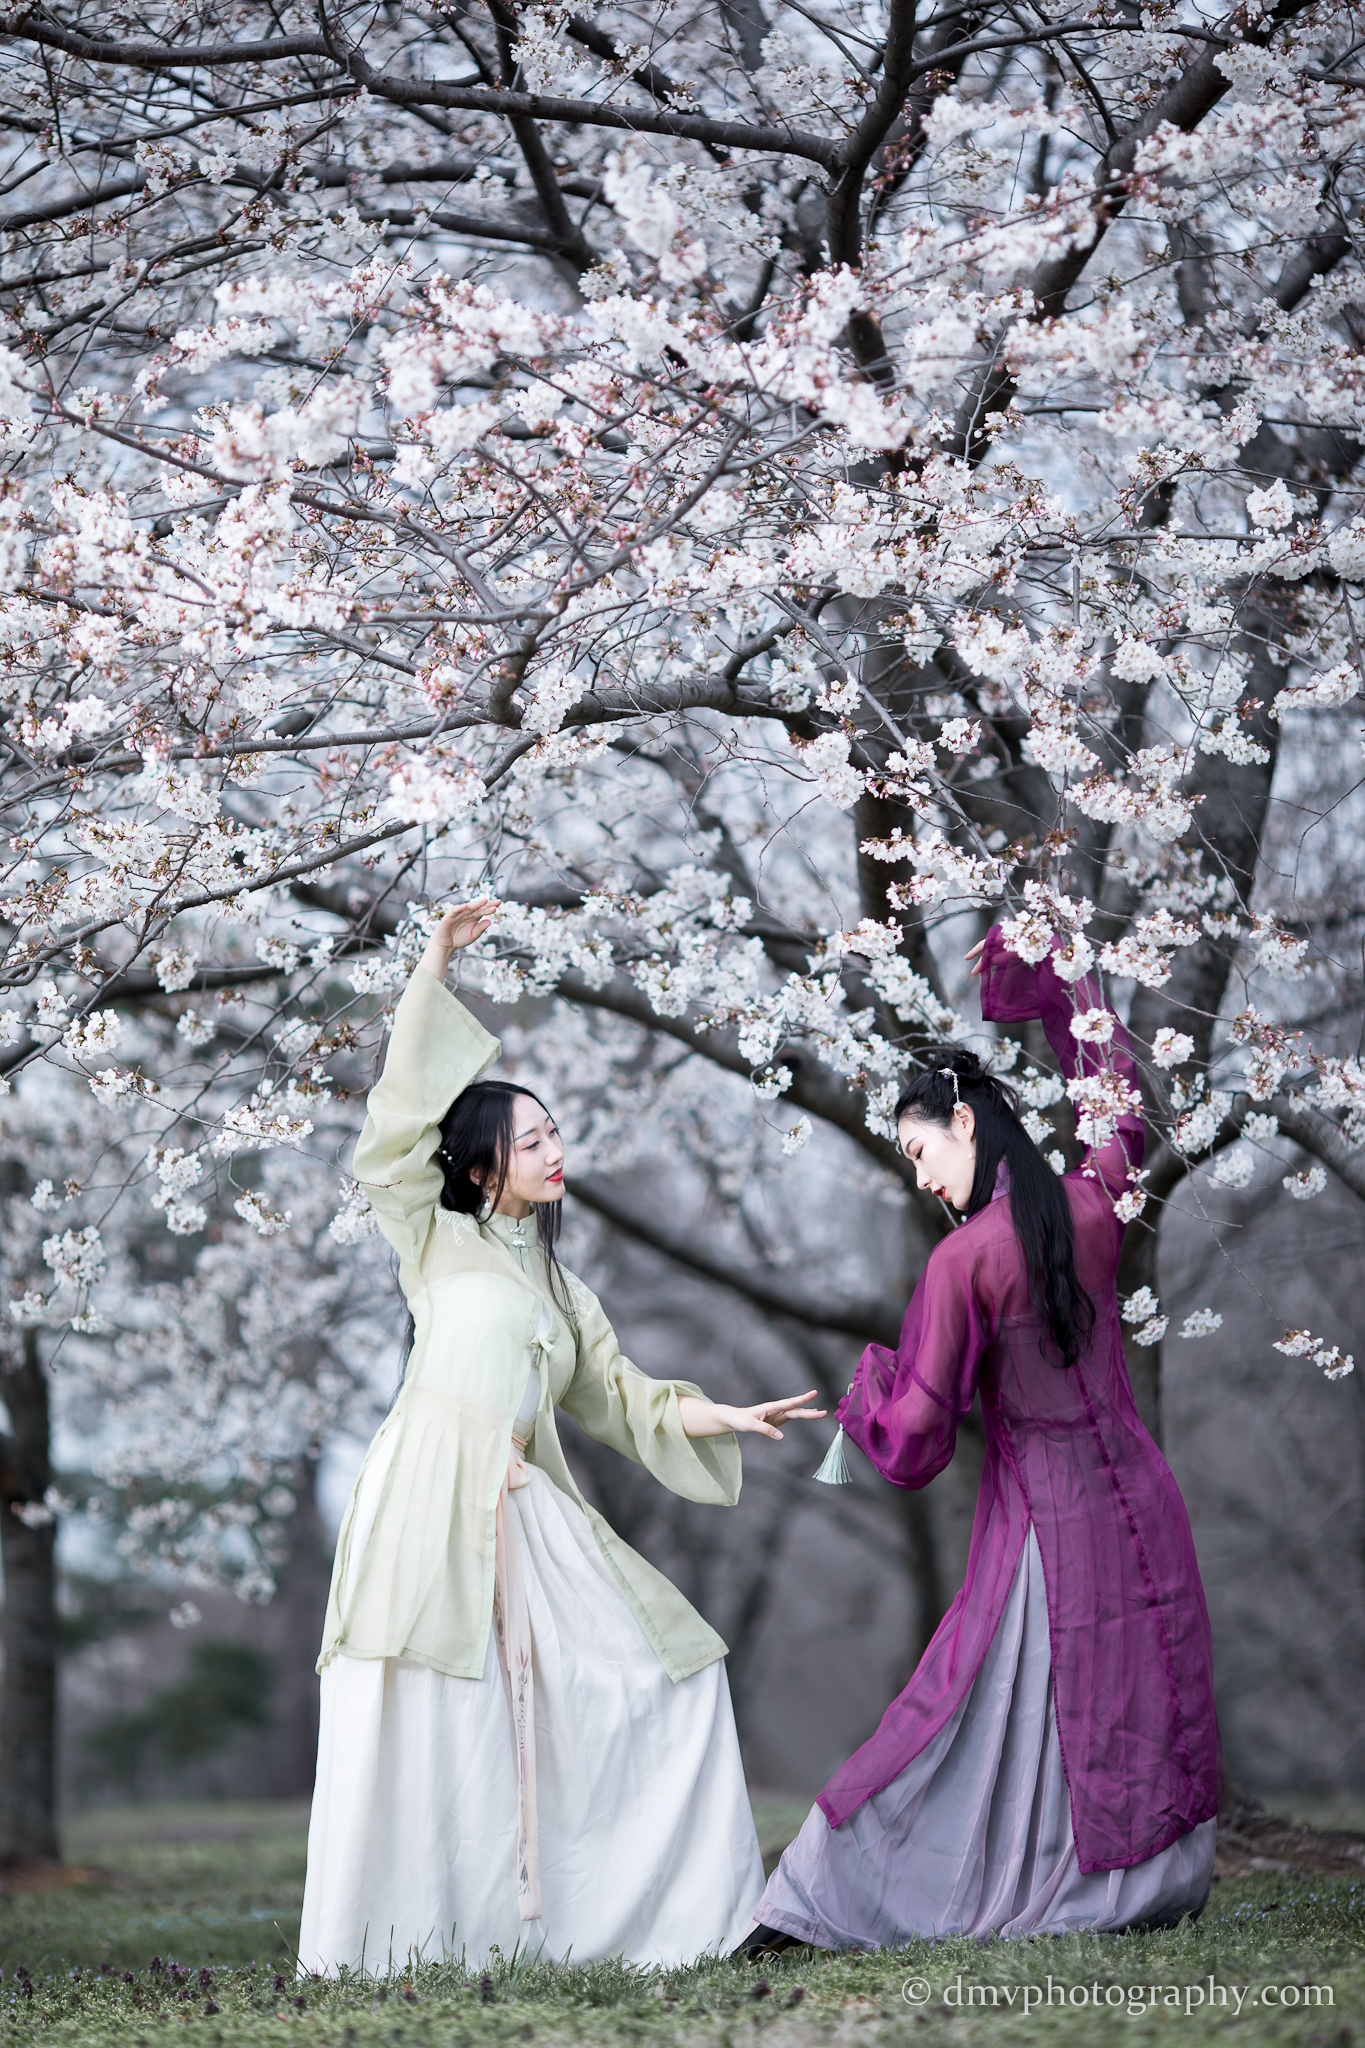 2017-03-25 - Day Cherry Blossom - 00076